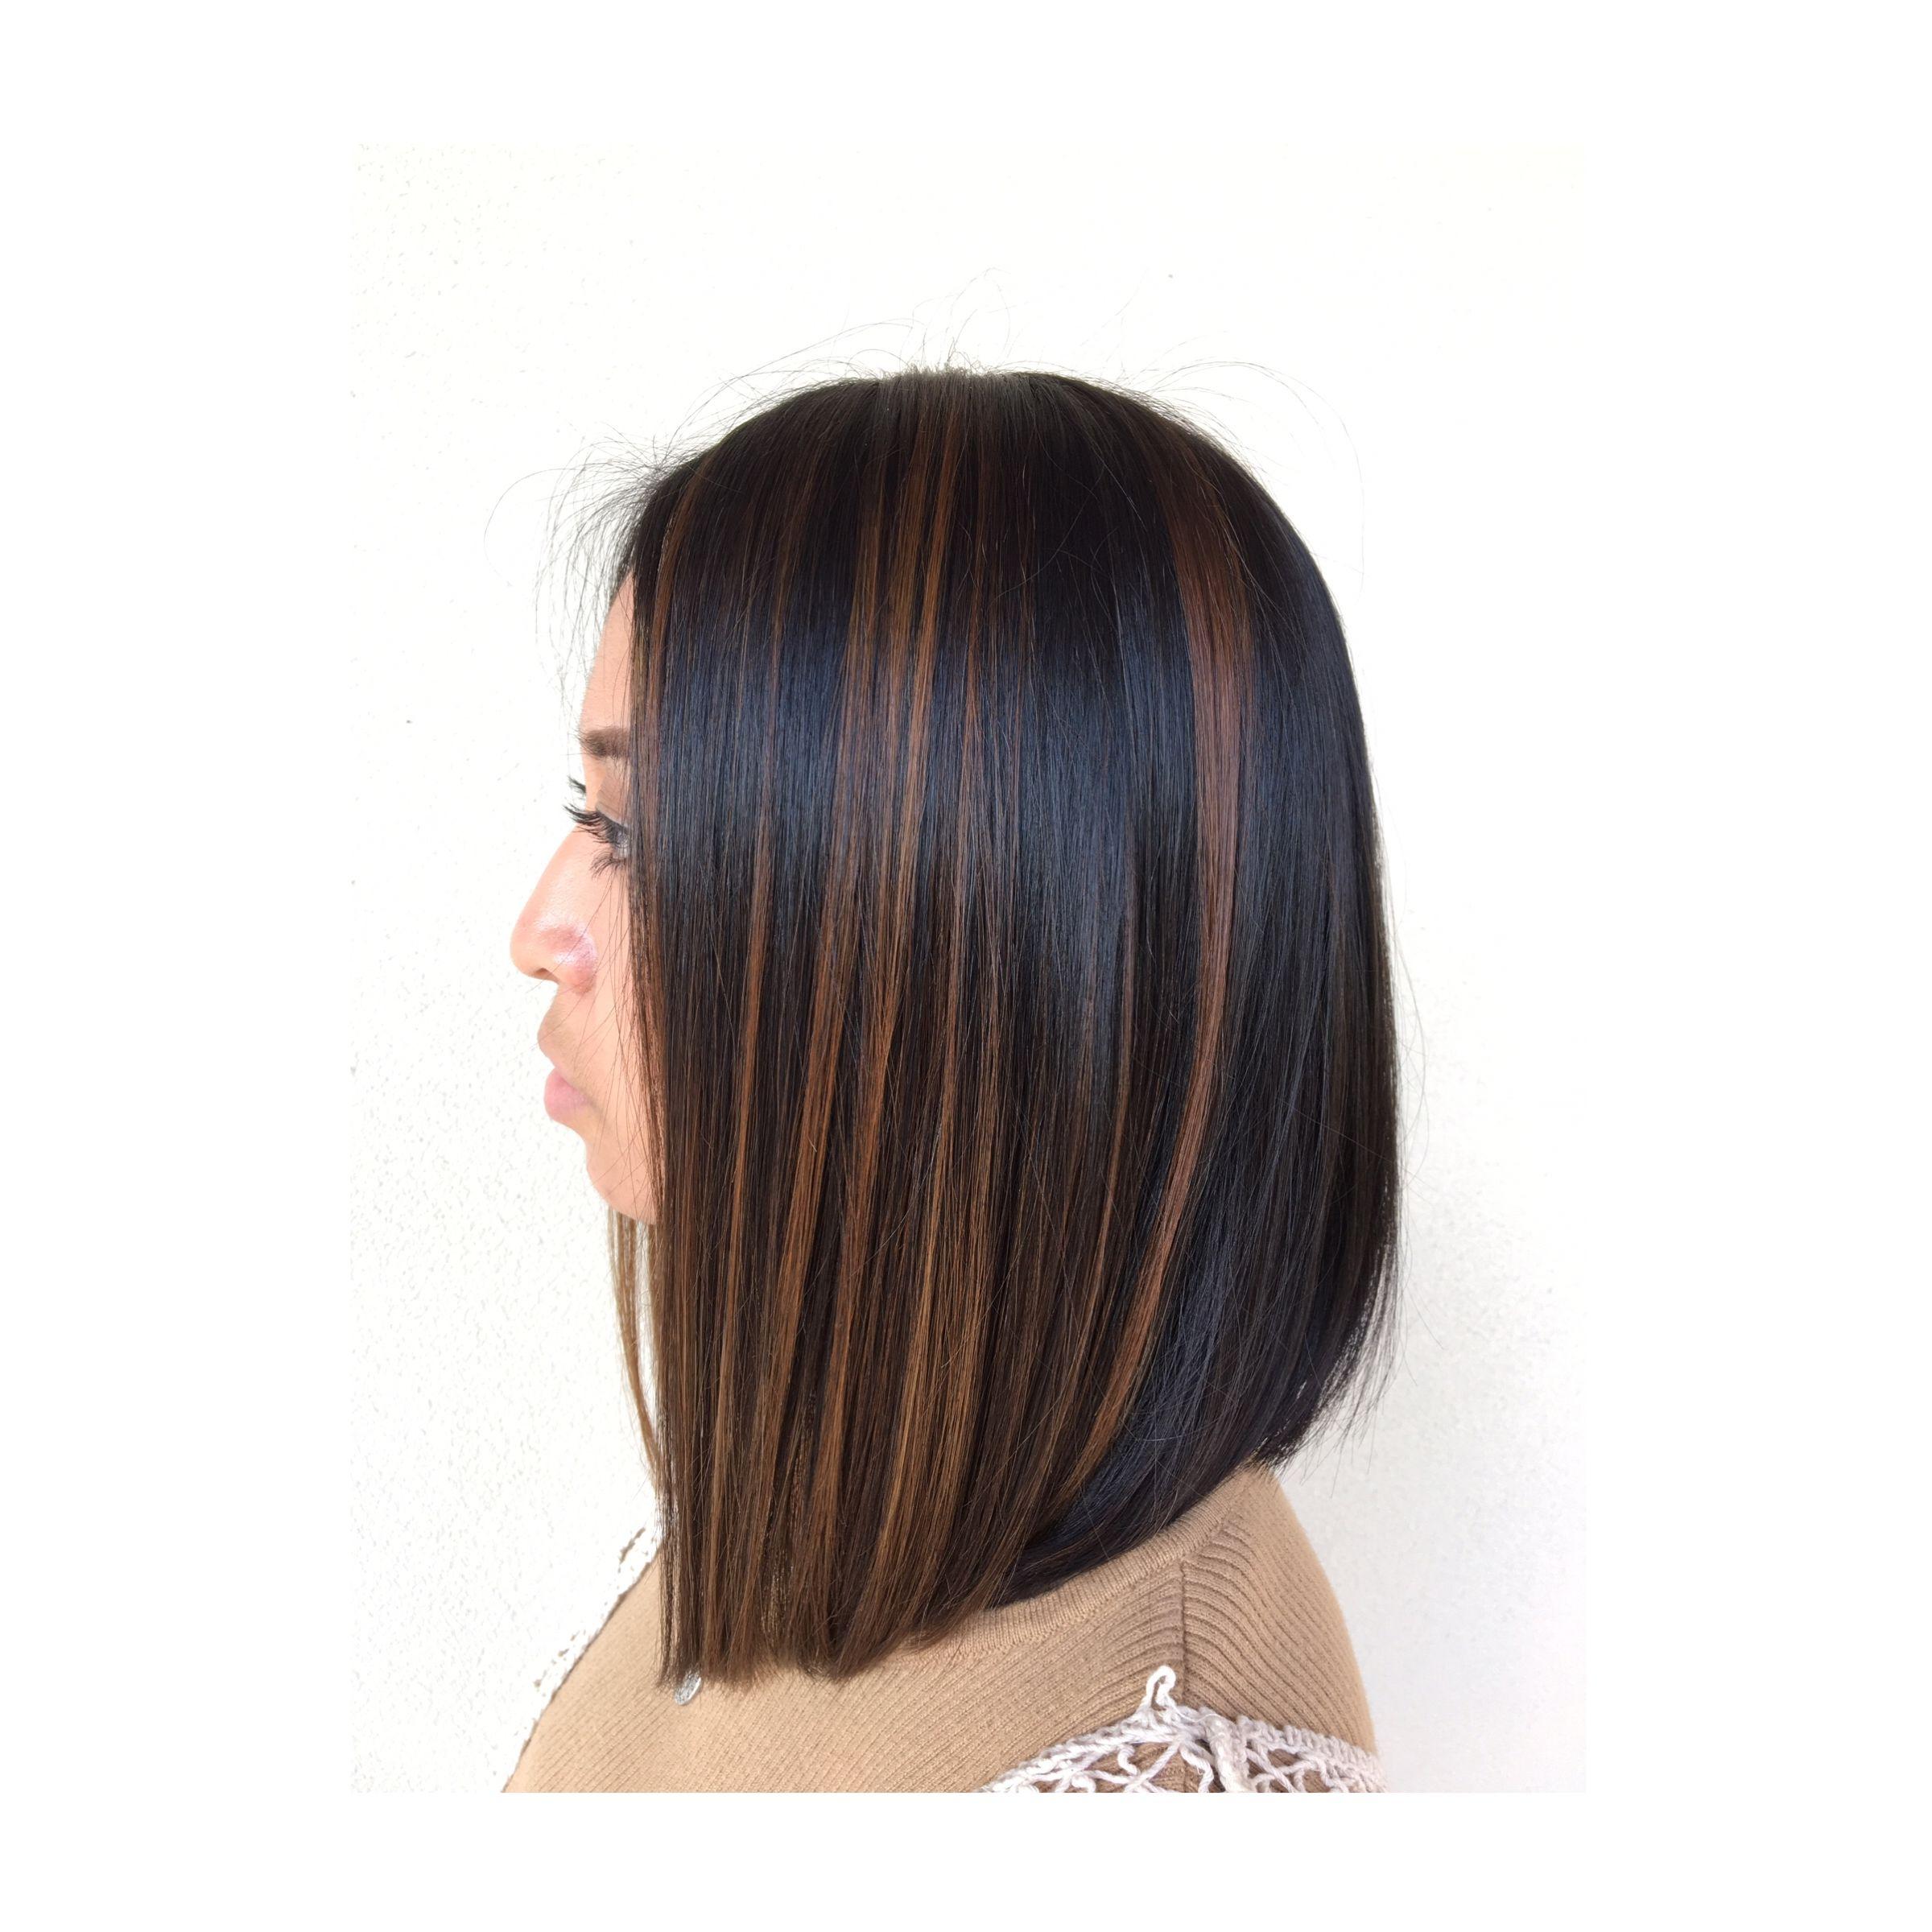 Face Frame Balayage + Angled Bob #caramel #lob #haircut With Regard To Warm Balayage On Short Angled Haircuts (View 15 of 20)